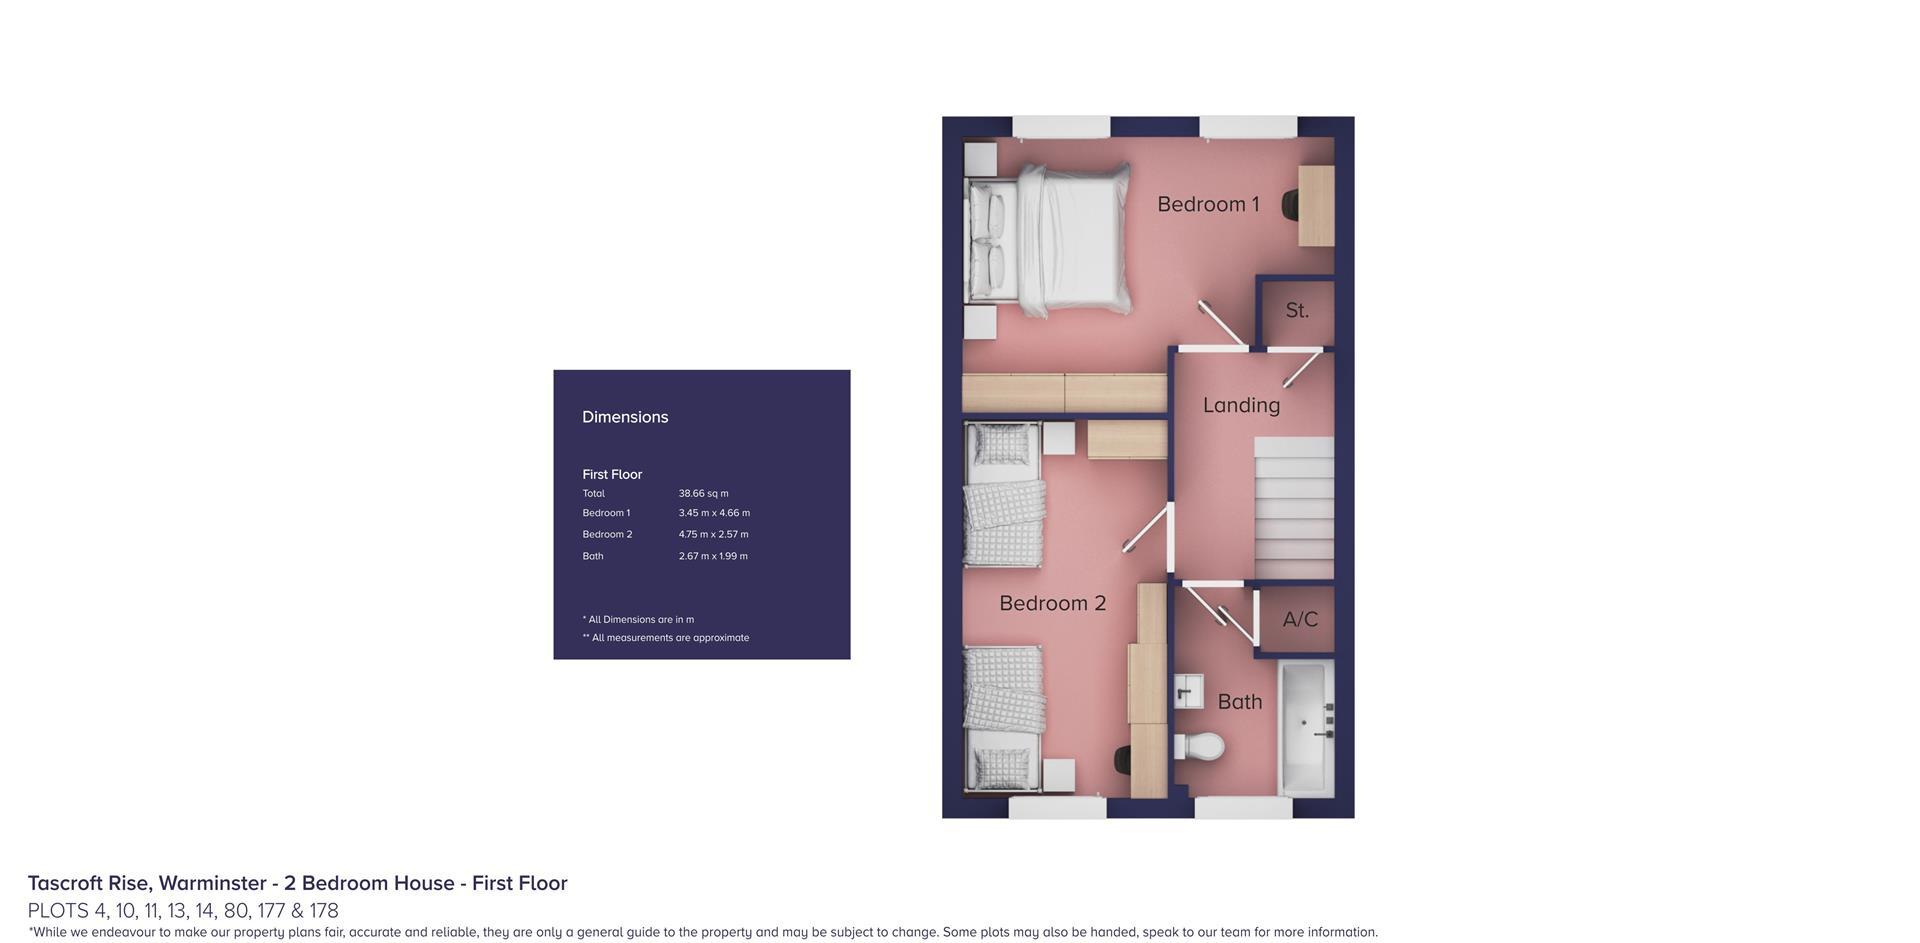 Tascroft Rise, Warminster_Plots 4, 10, 11, 13, 14,